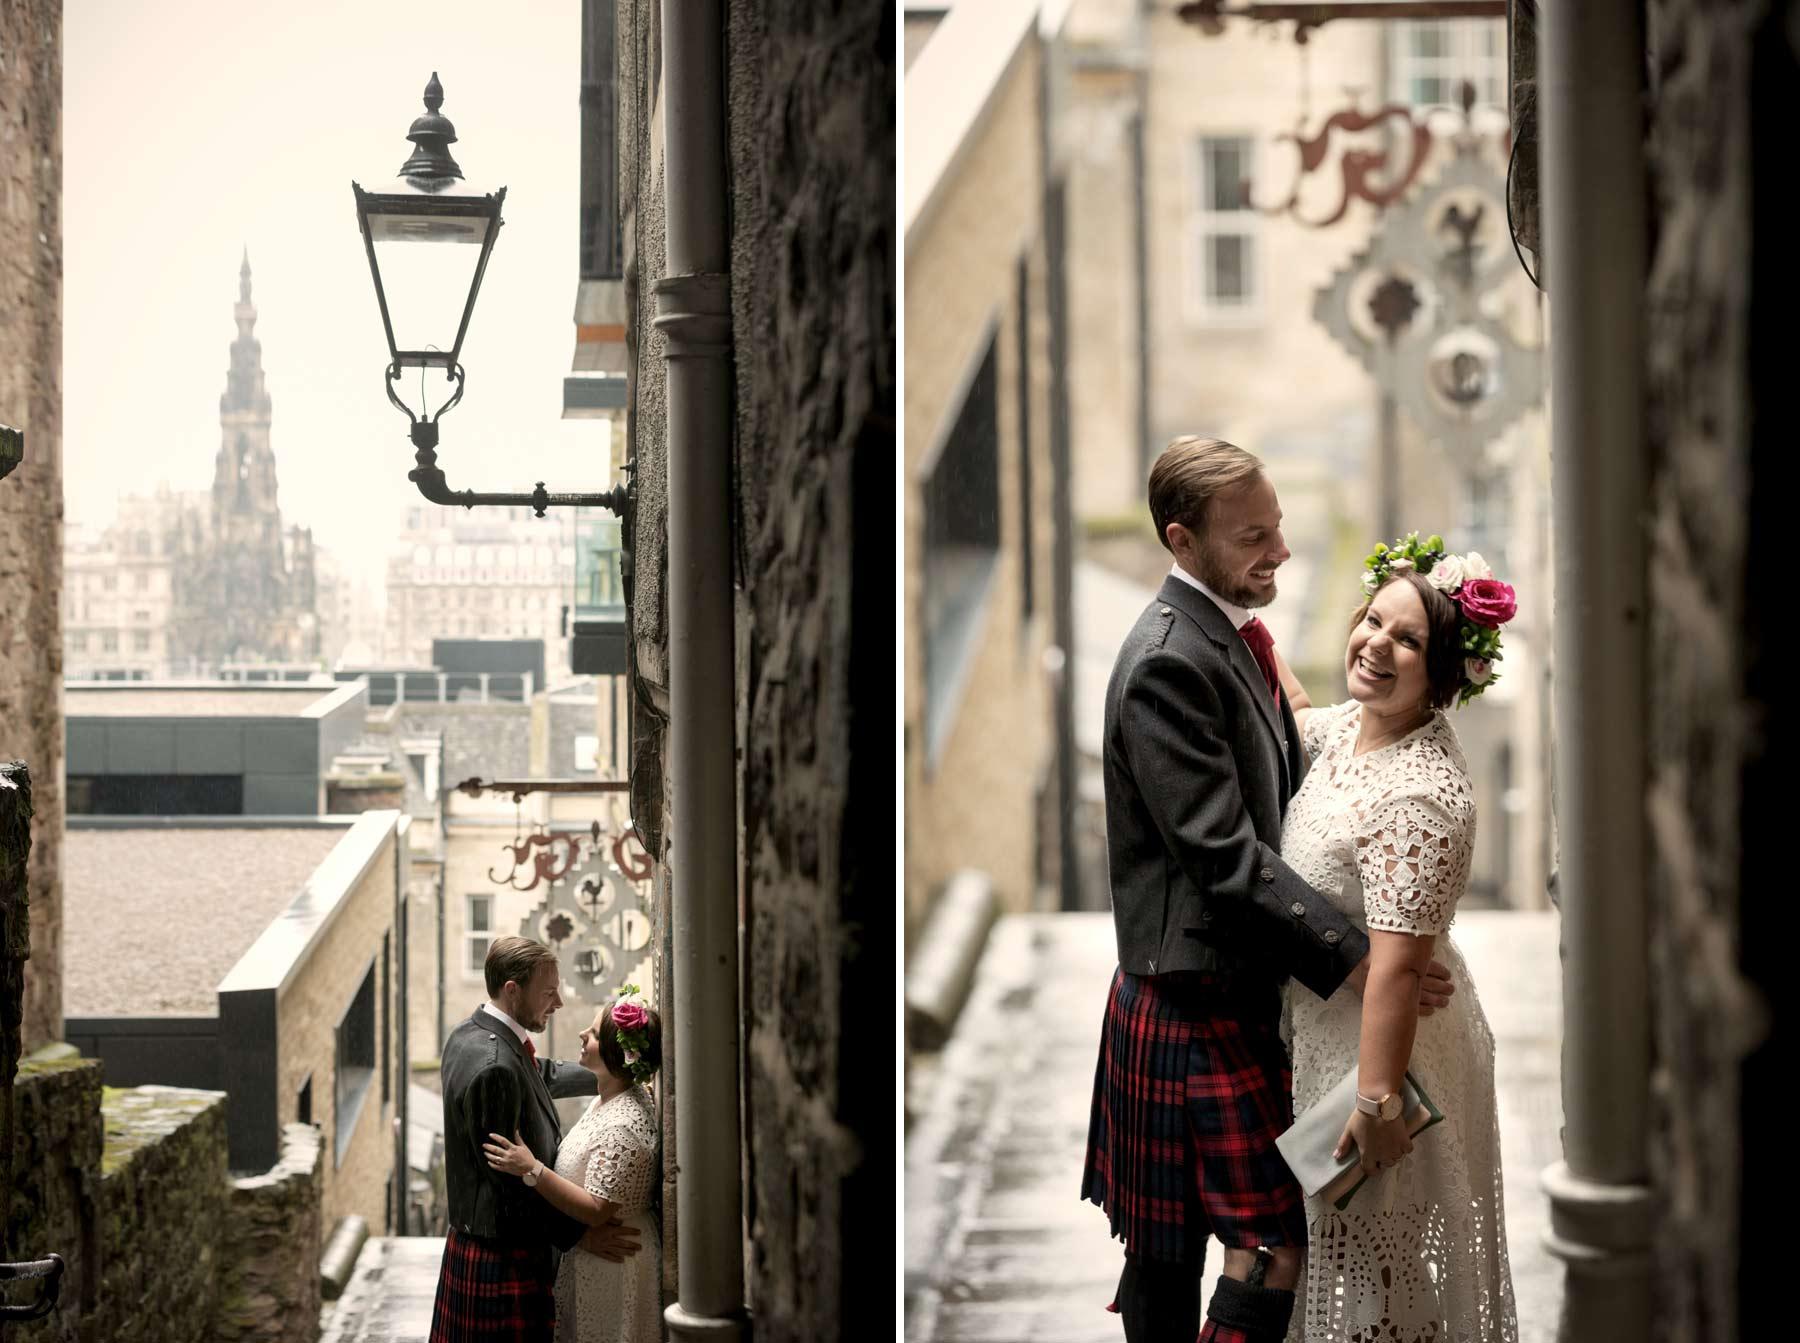 Bride, groom, wedding, portraits, photography, Advocate Close, Edinburgh, Old Town, Scotland